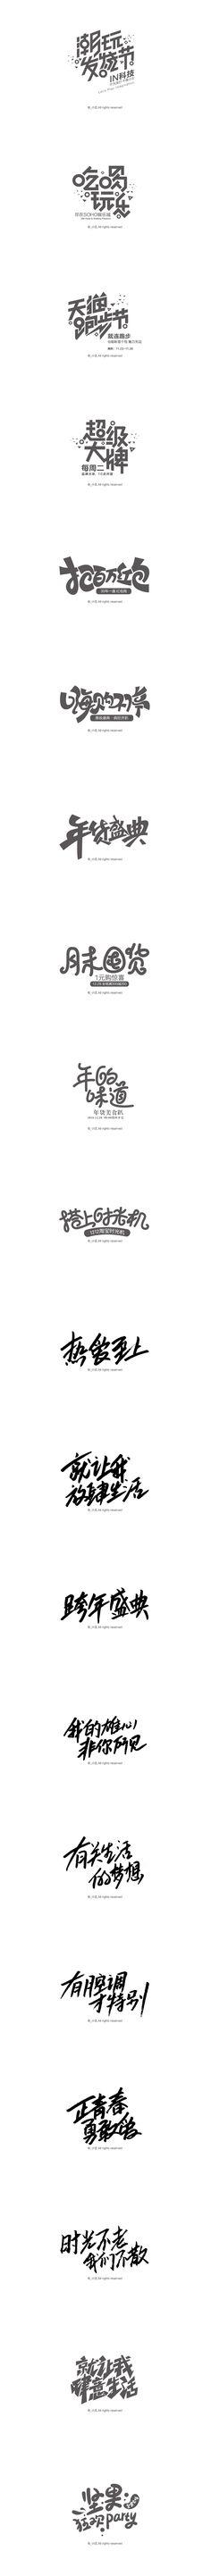 13225072692213517890 Graphic Design Letters, Slogan Design, Typo Design, Word Design, Typographic Design, Graphic Design Typography, Lettering Design, Chinese Fonts Design, Japanese Graphic Design